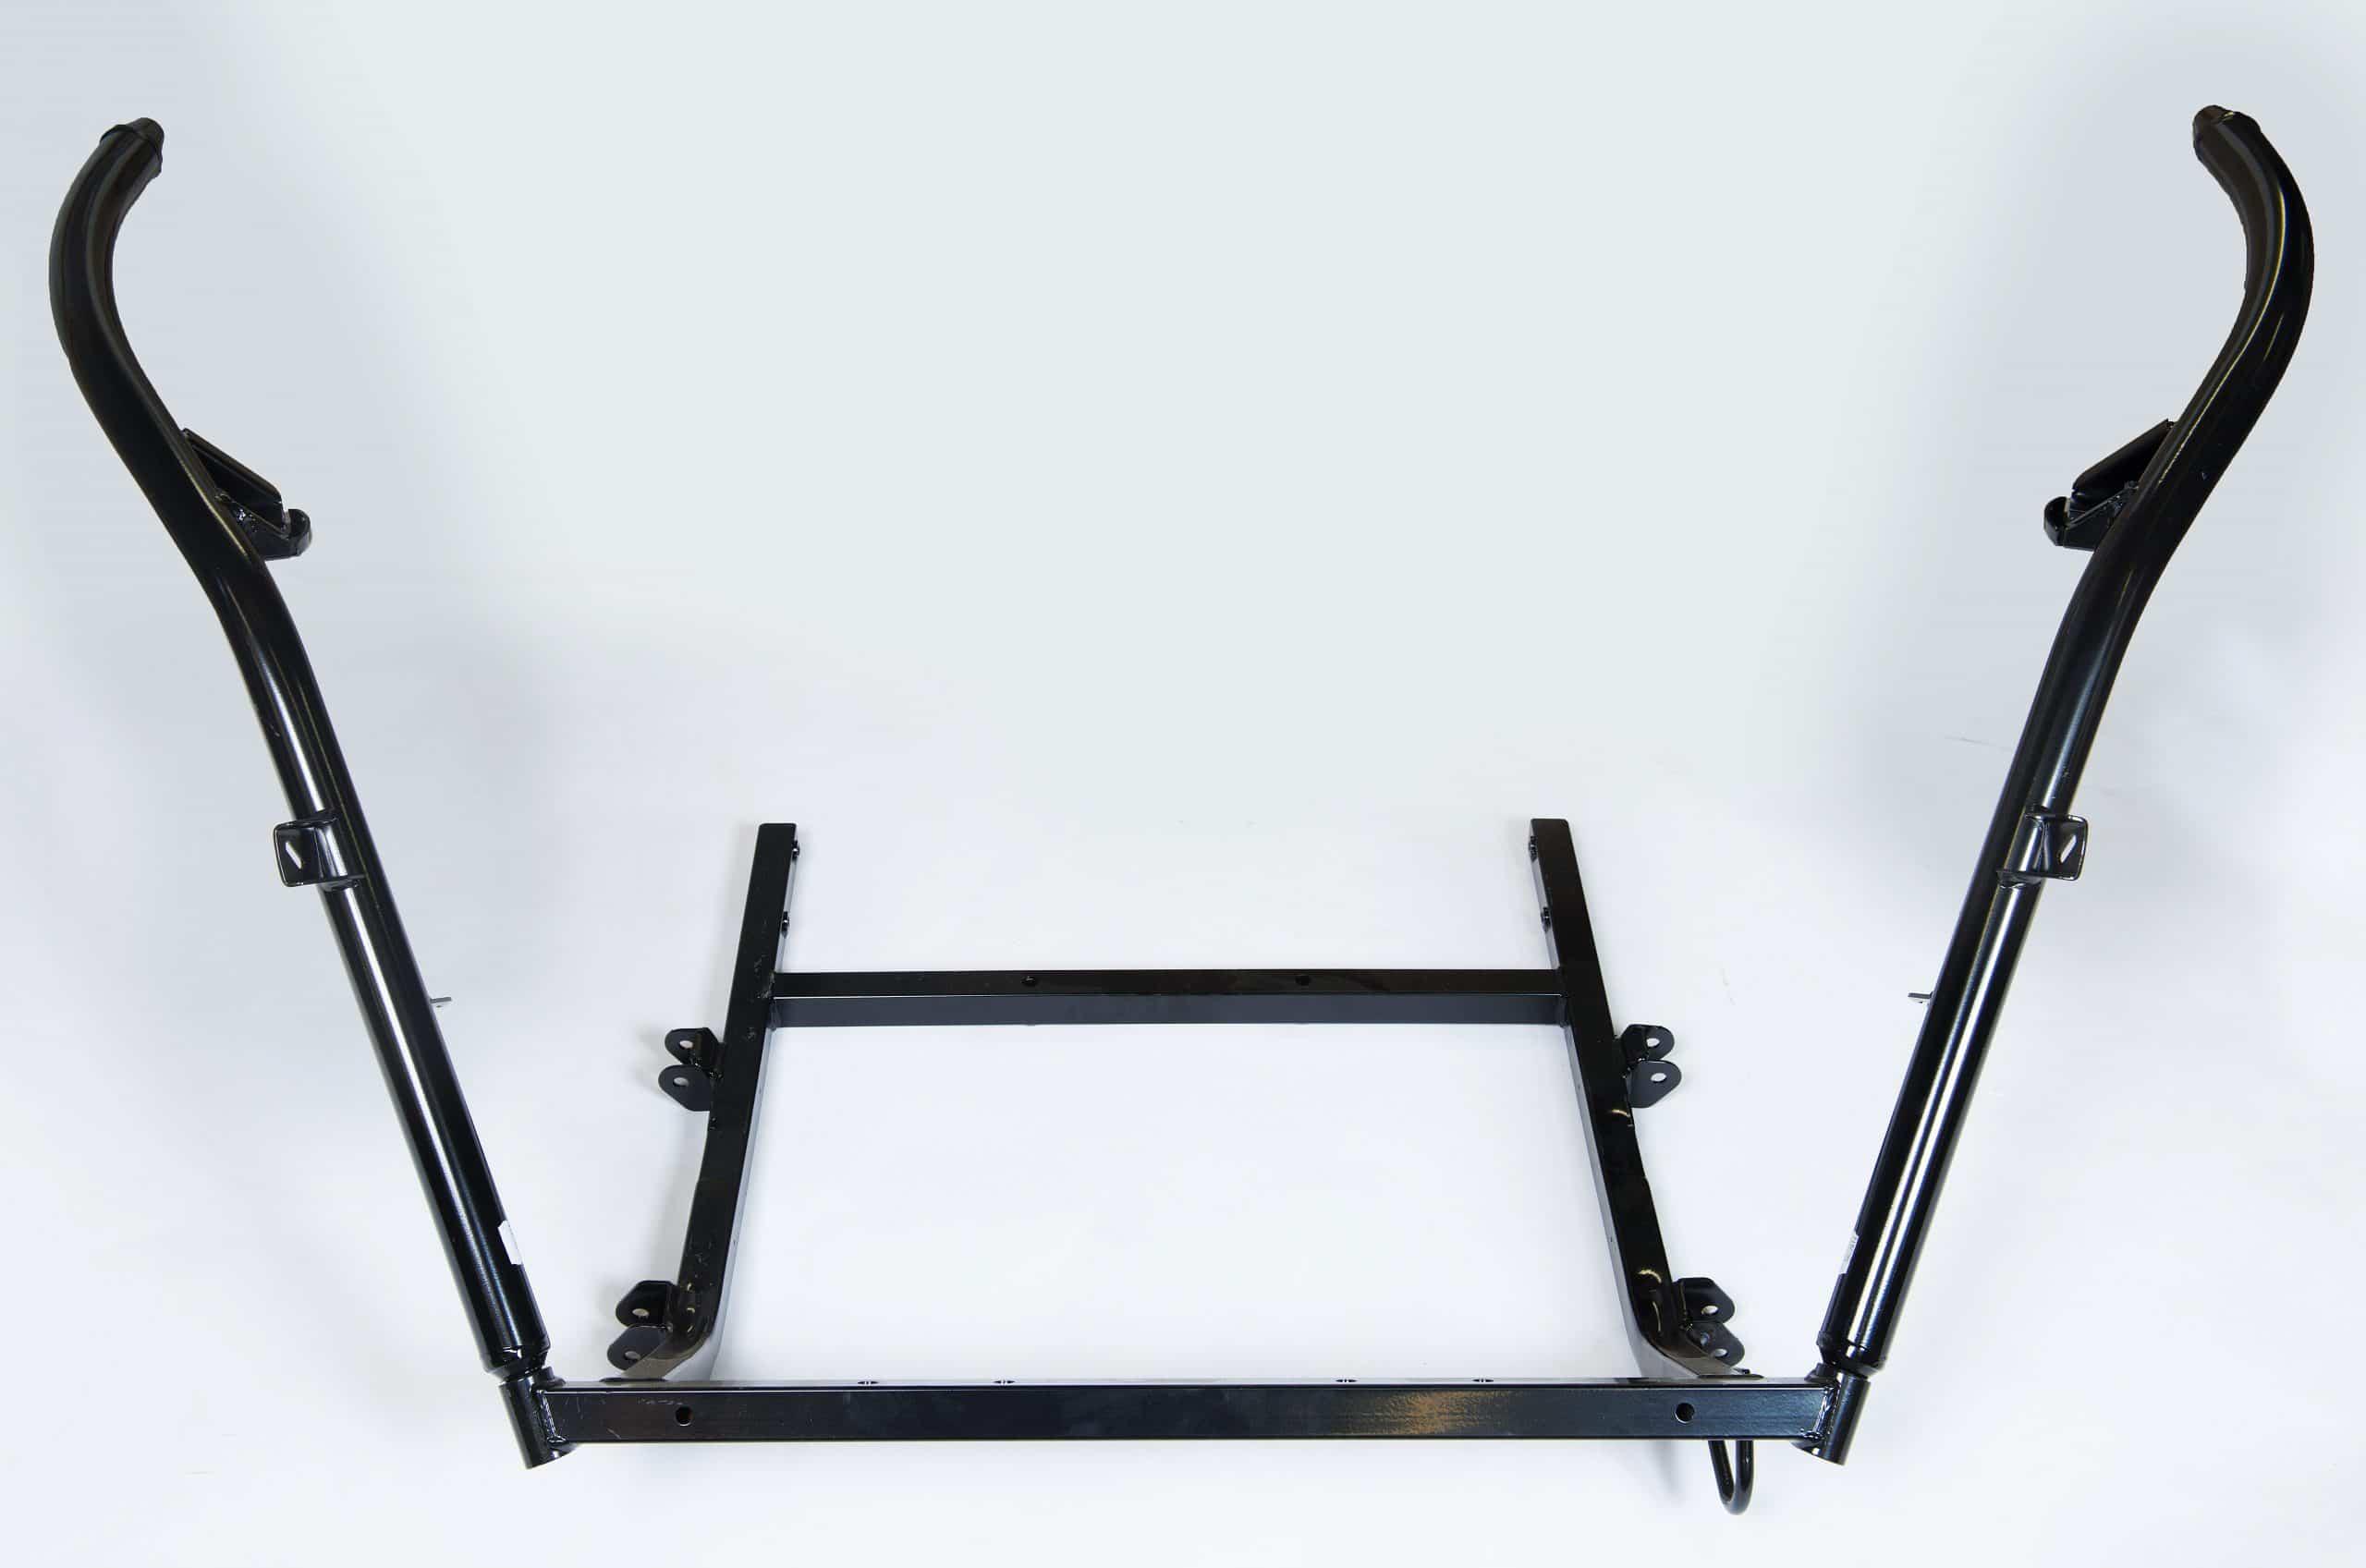 tubular motor cradle assembly